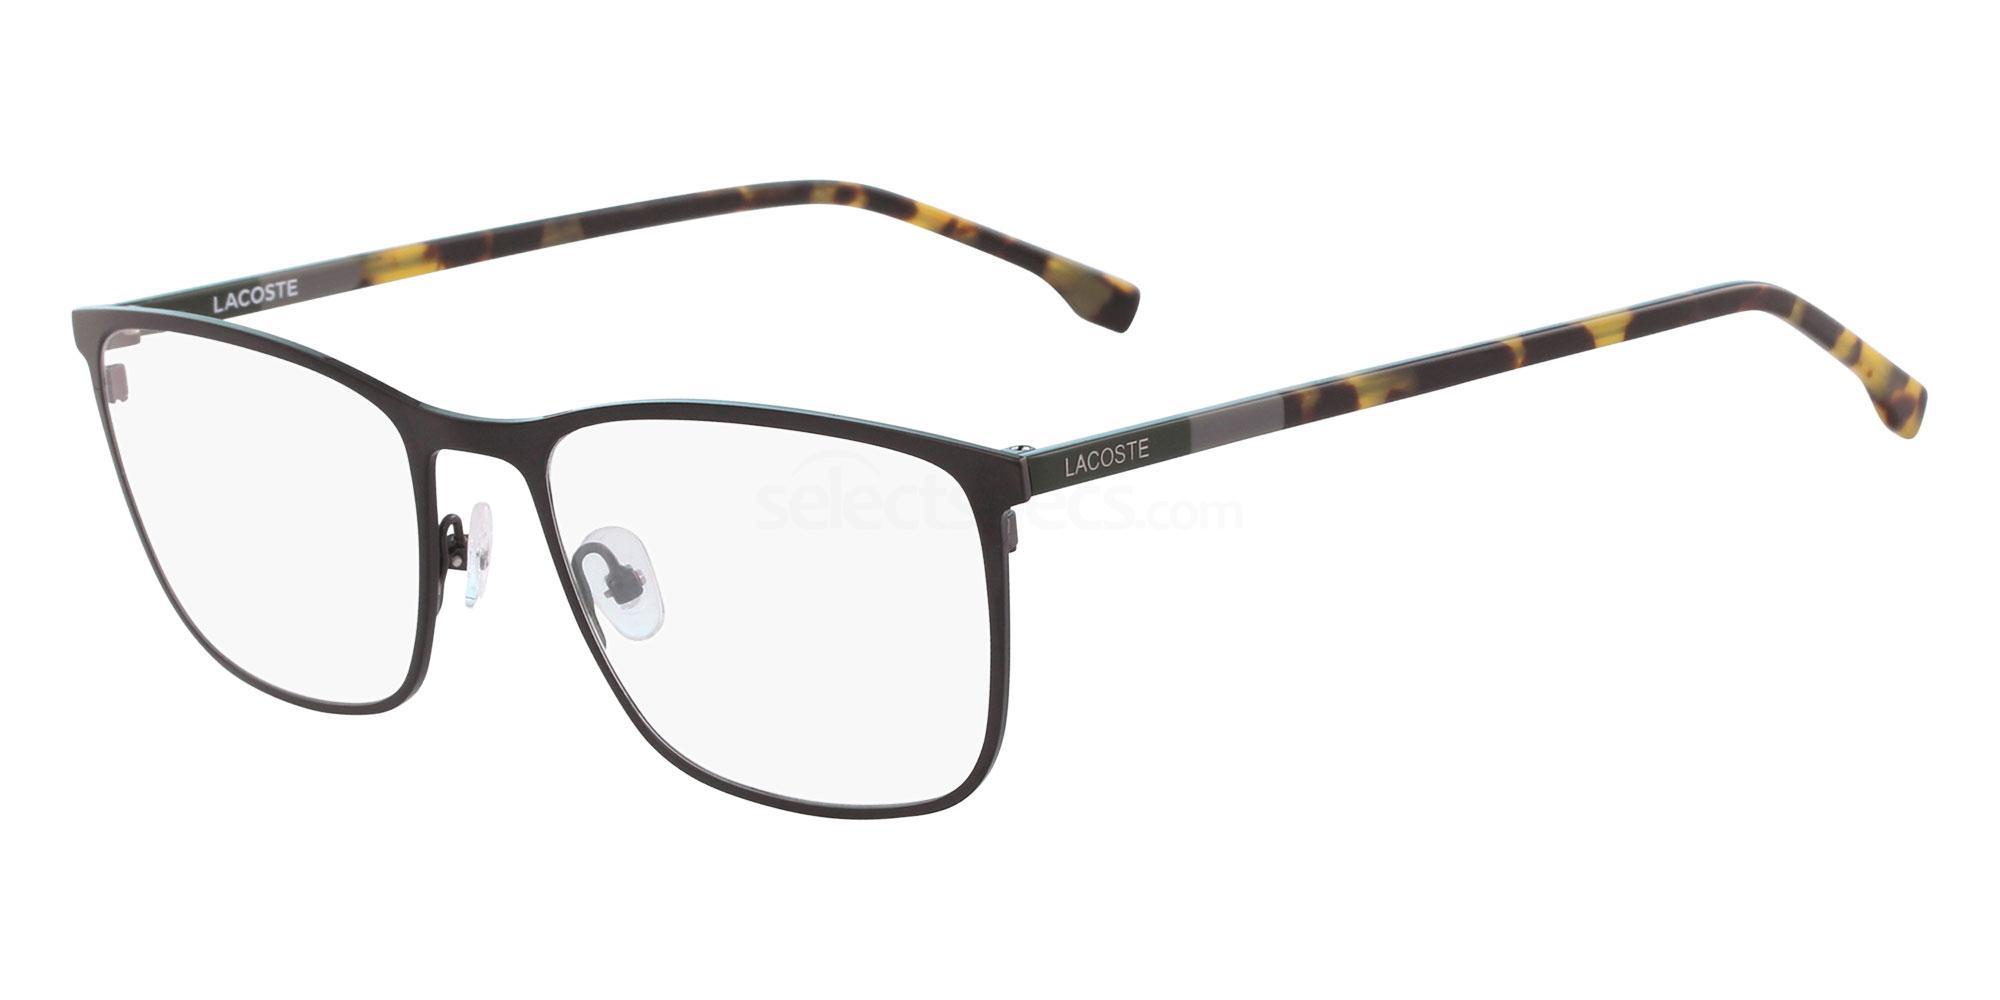 001 L2247 Glasses, Lacoste